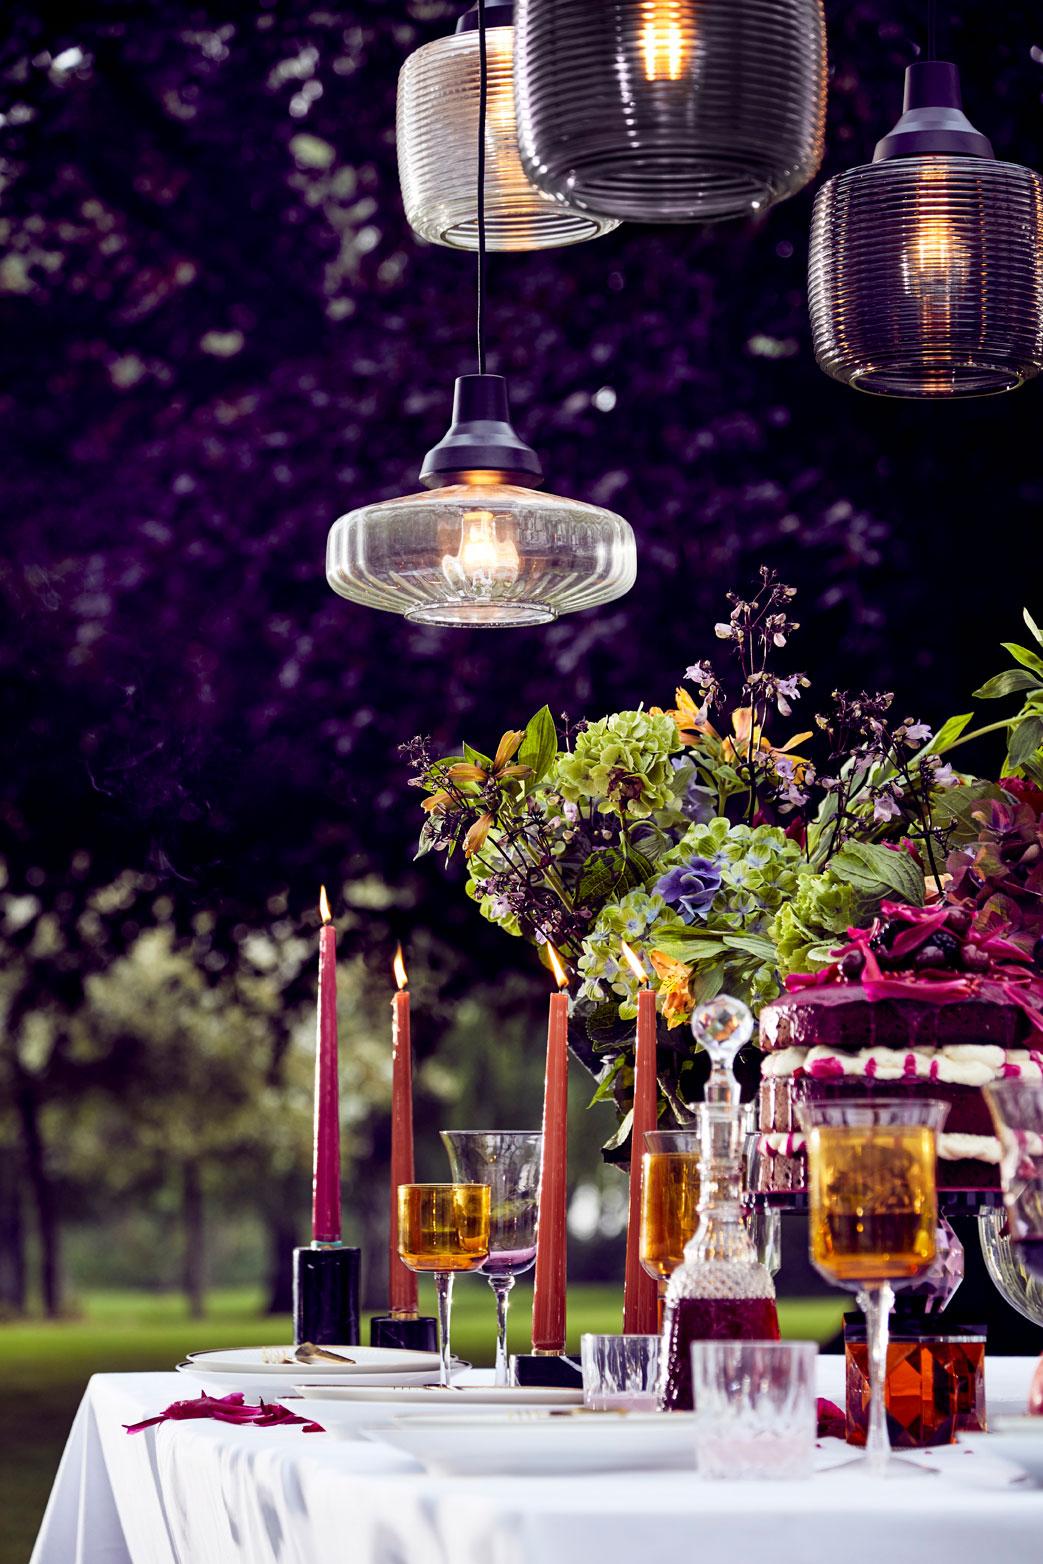 Høeg-+-Møller-17.05.30-Design-By-Us-Garden-party1985.jpg